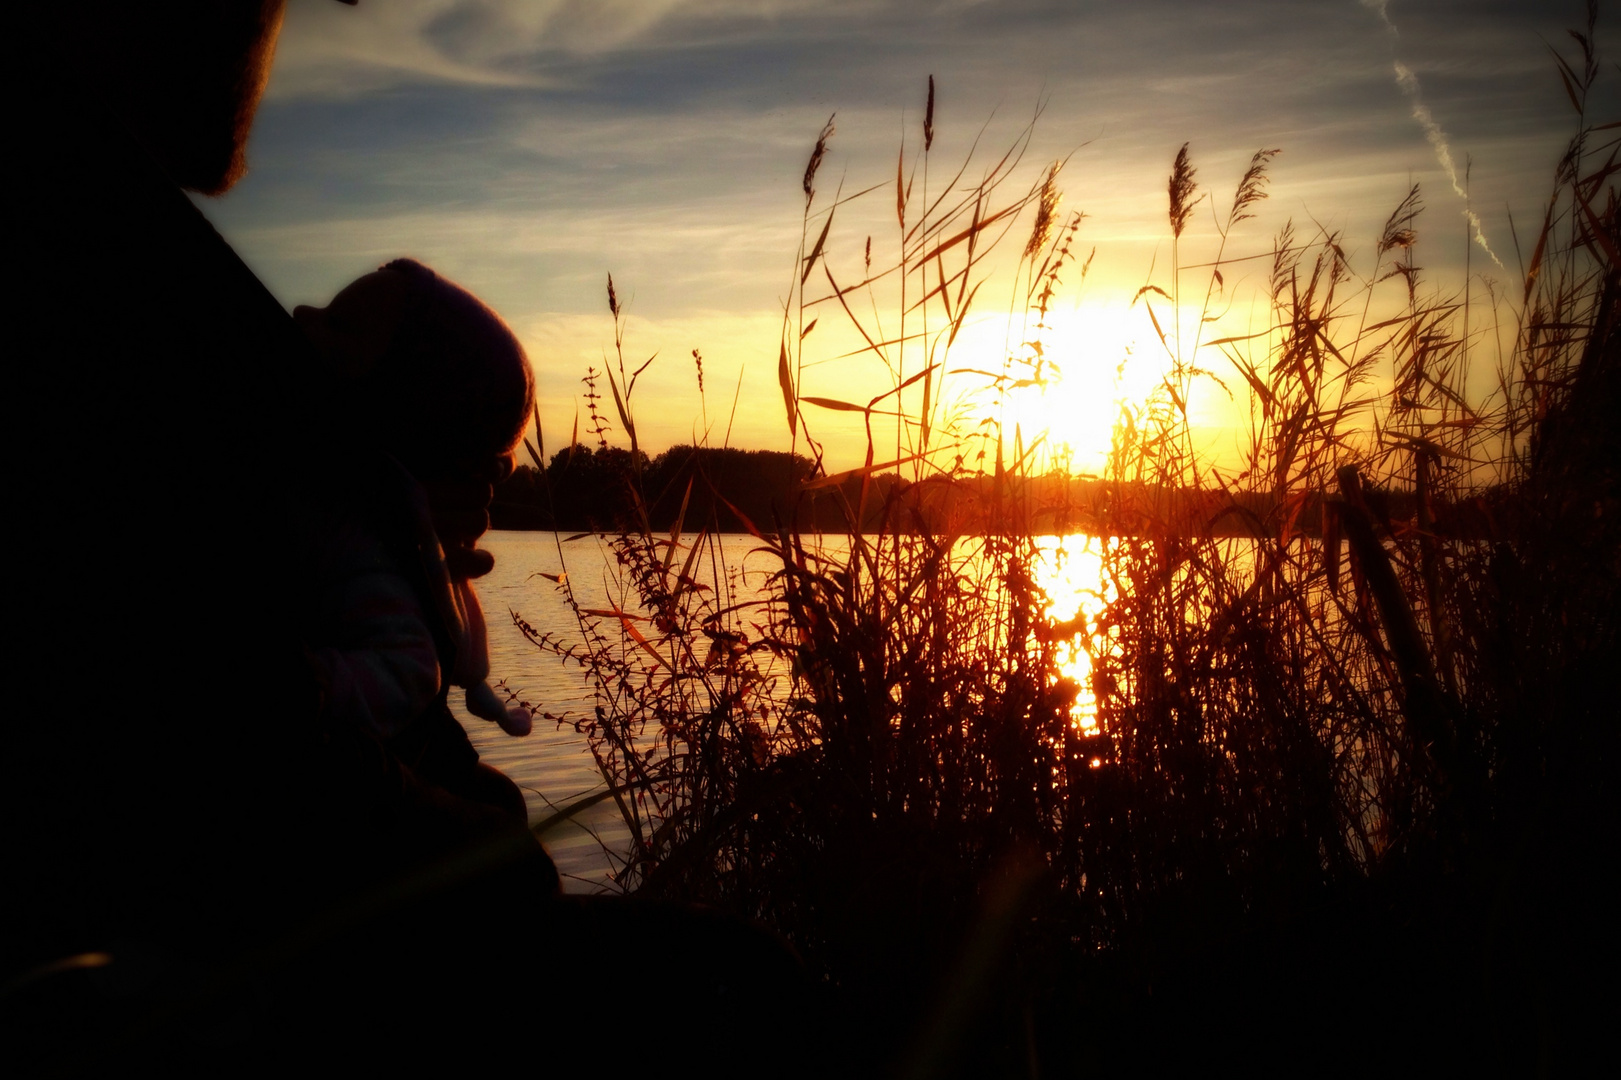 Sonnenuntergang am Torfmoorsee